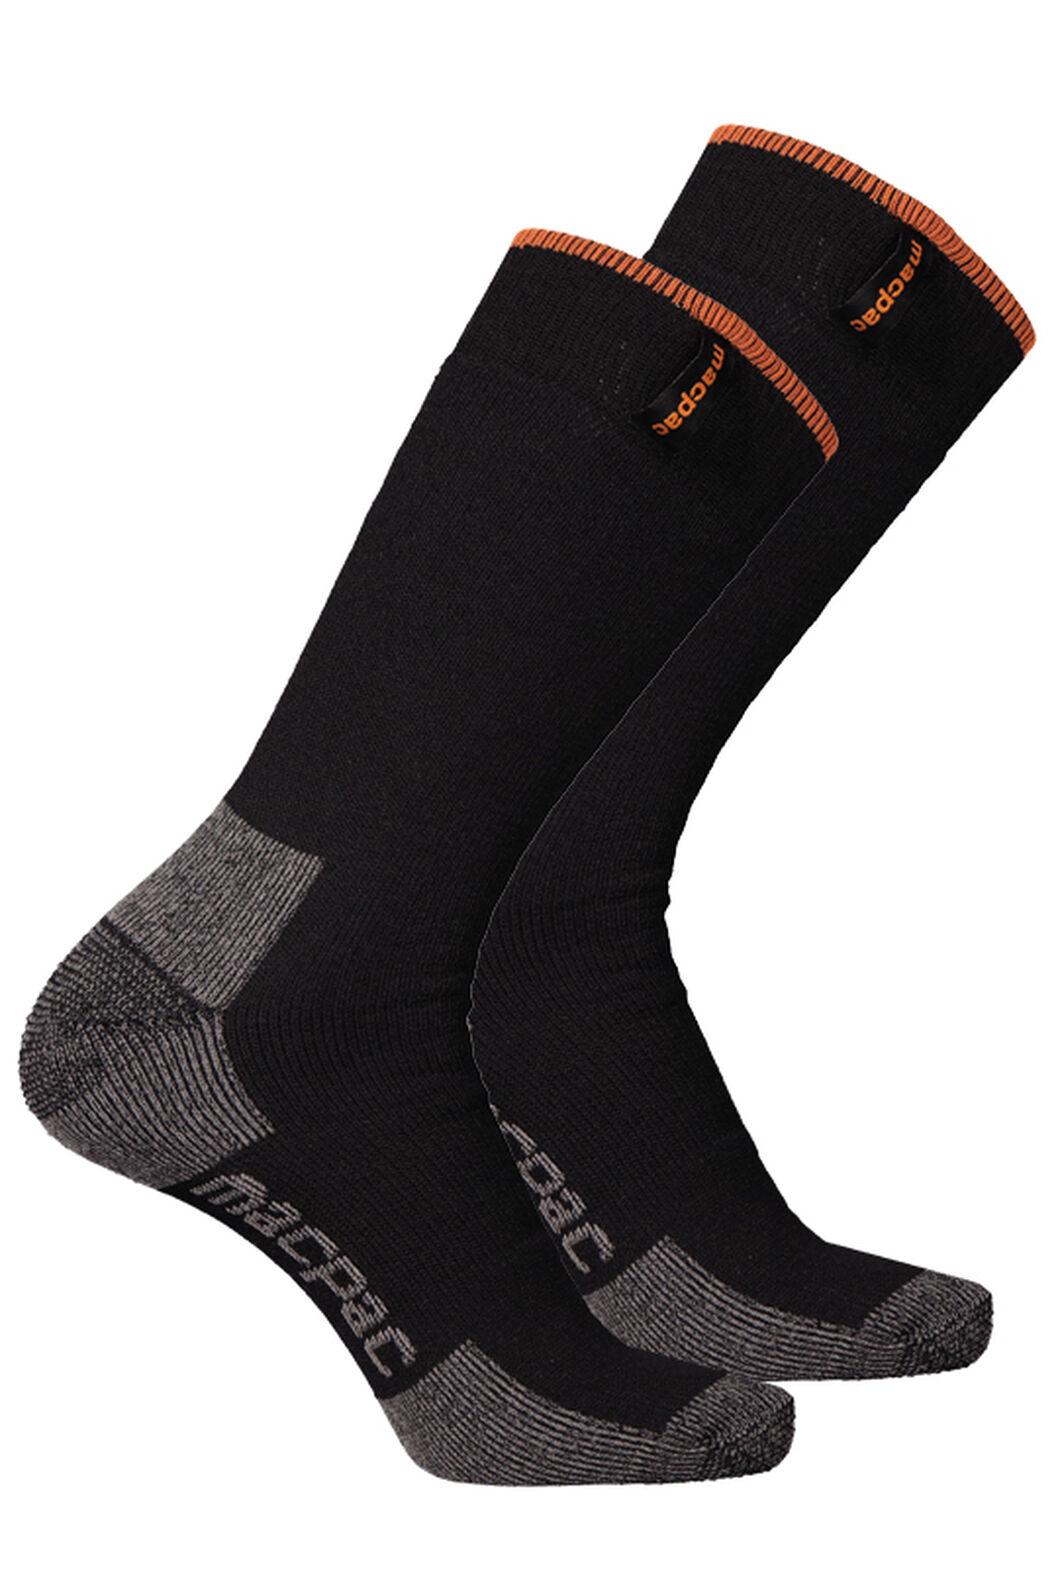 Thermal Socks 2 Pack, Black/Black, hi-res